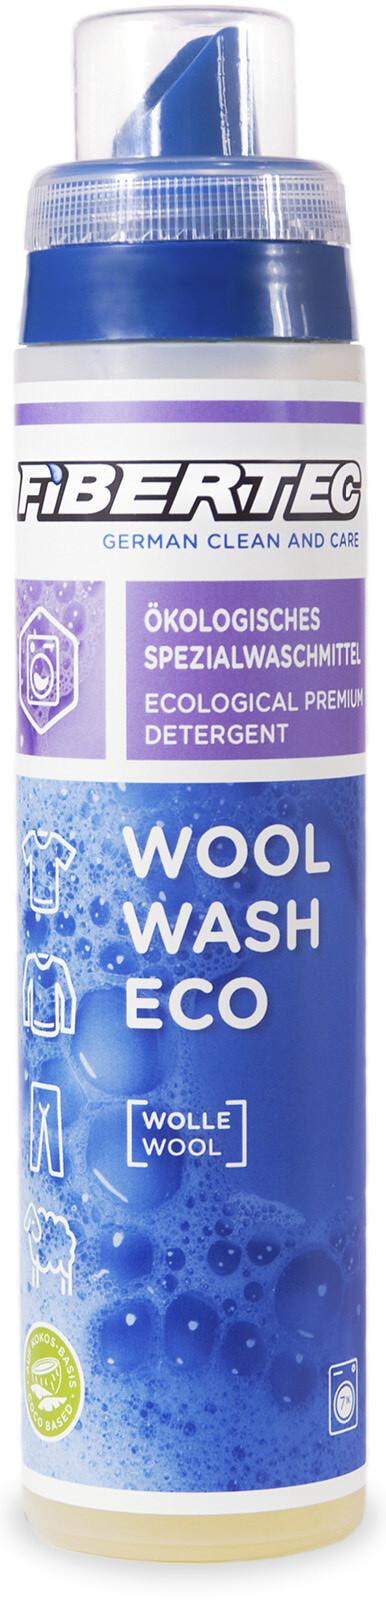 Fibertec Wool Wash Eco 250ml (2019) | Body maintenance